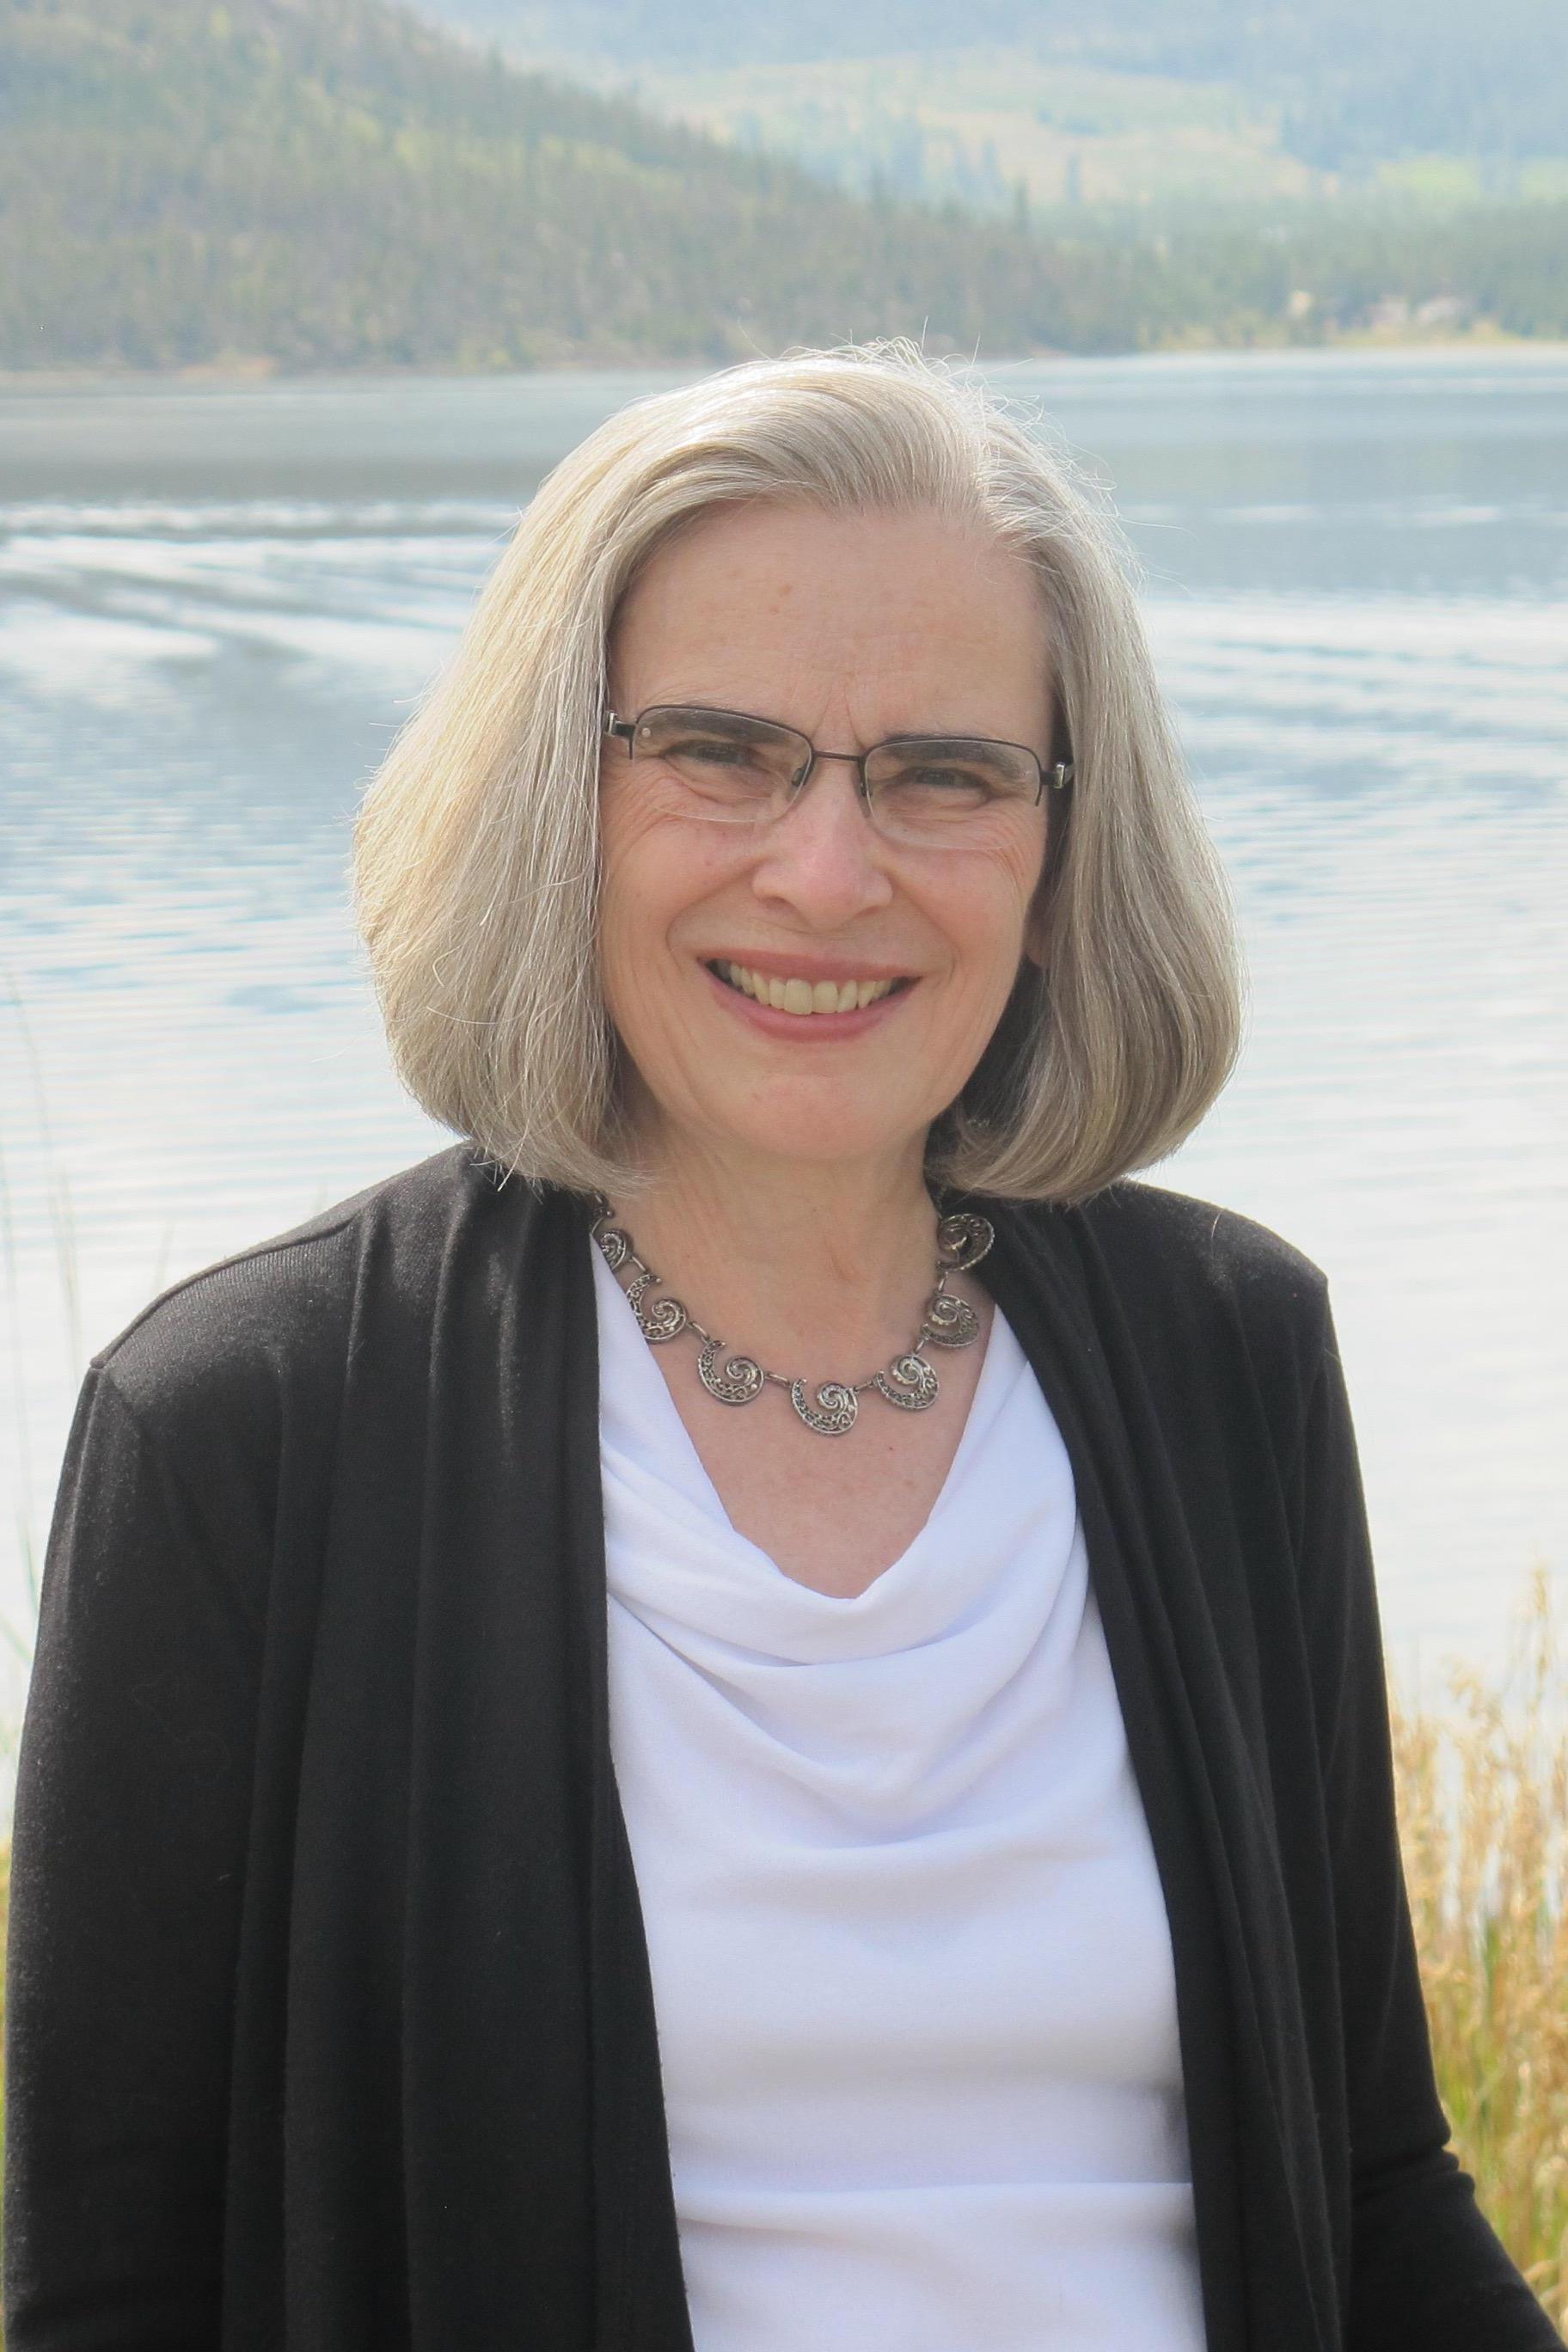 Susan Koba Portrait Photo